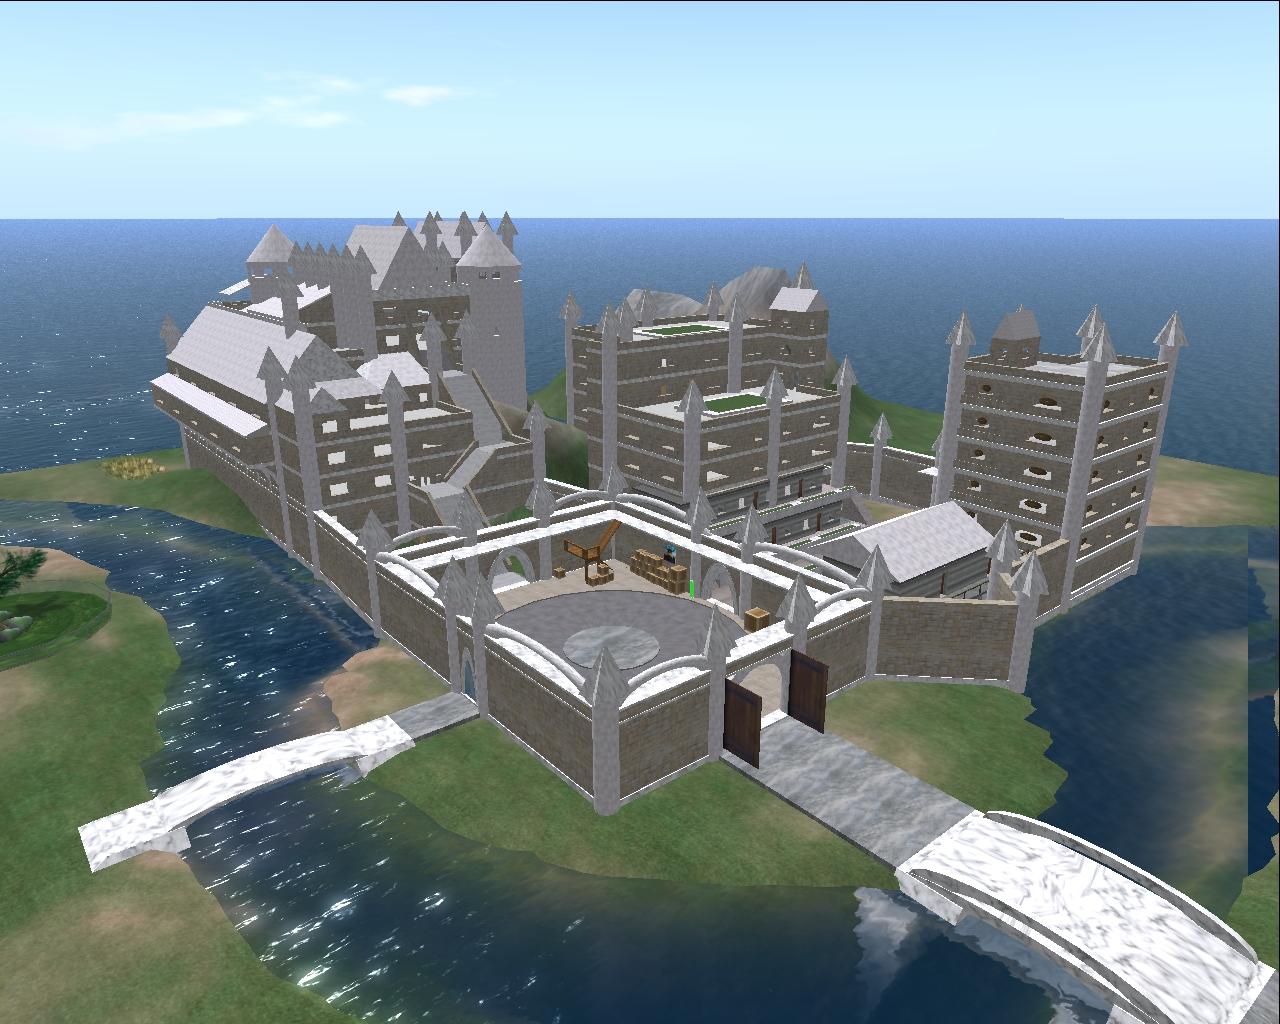 White Dragon Castle